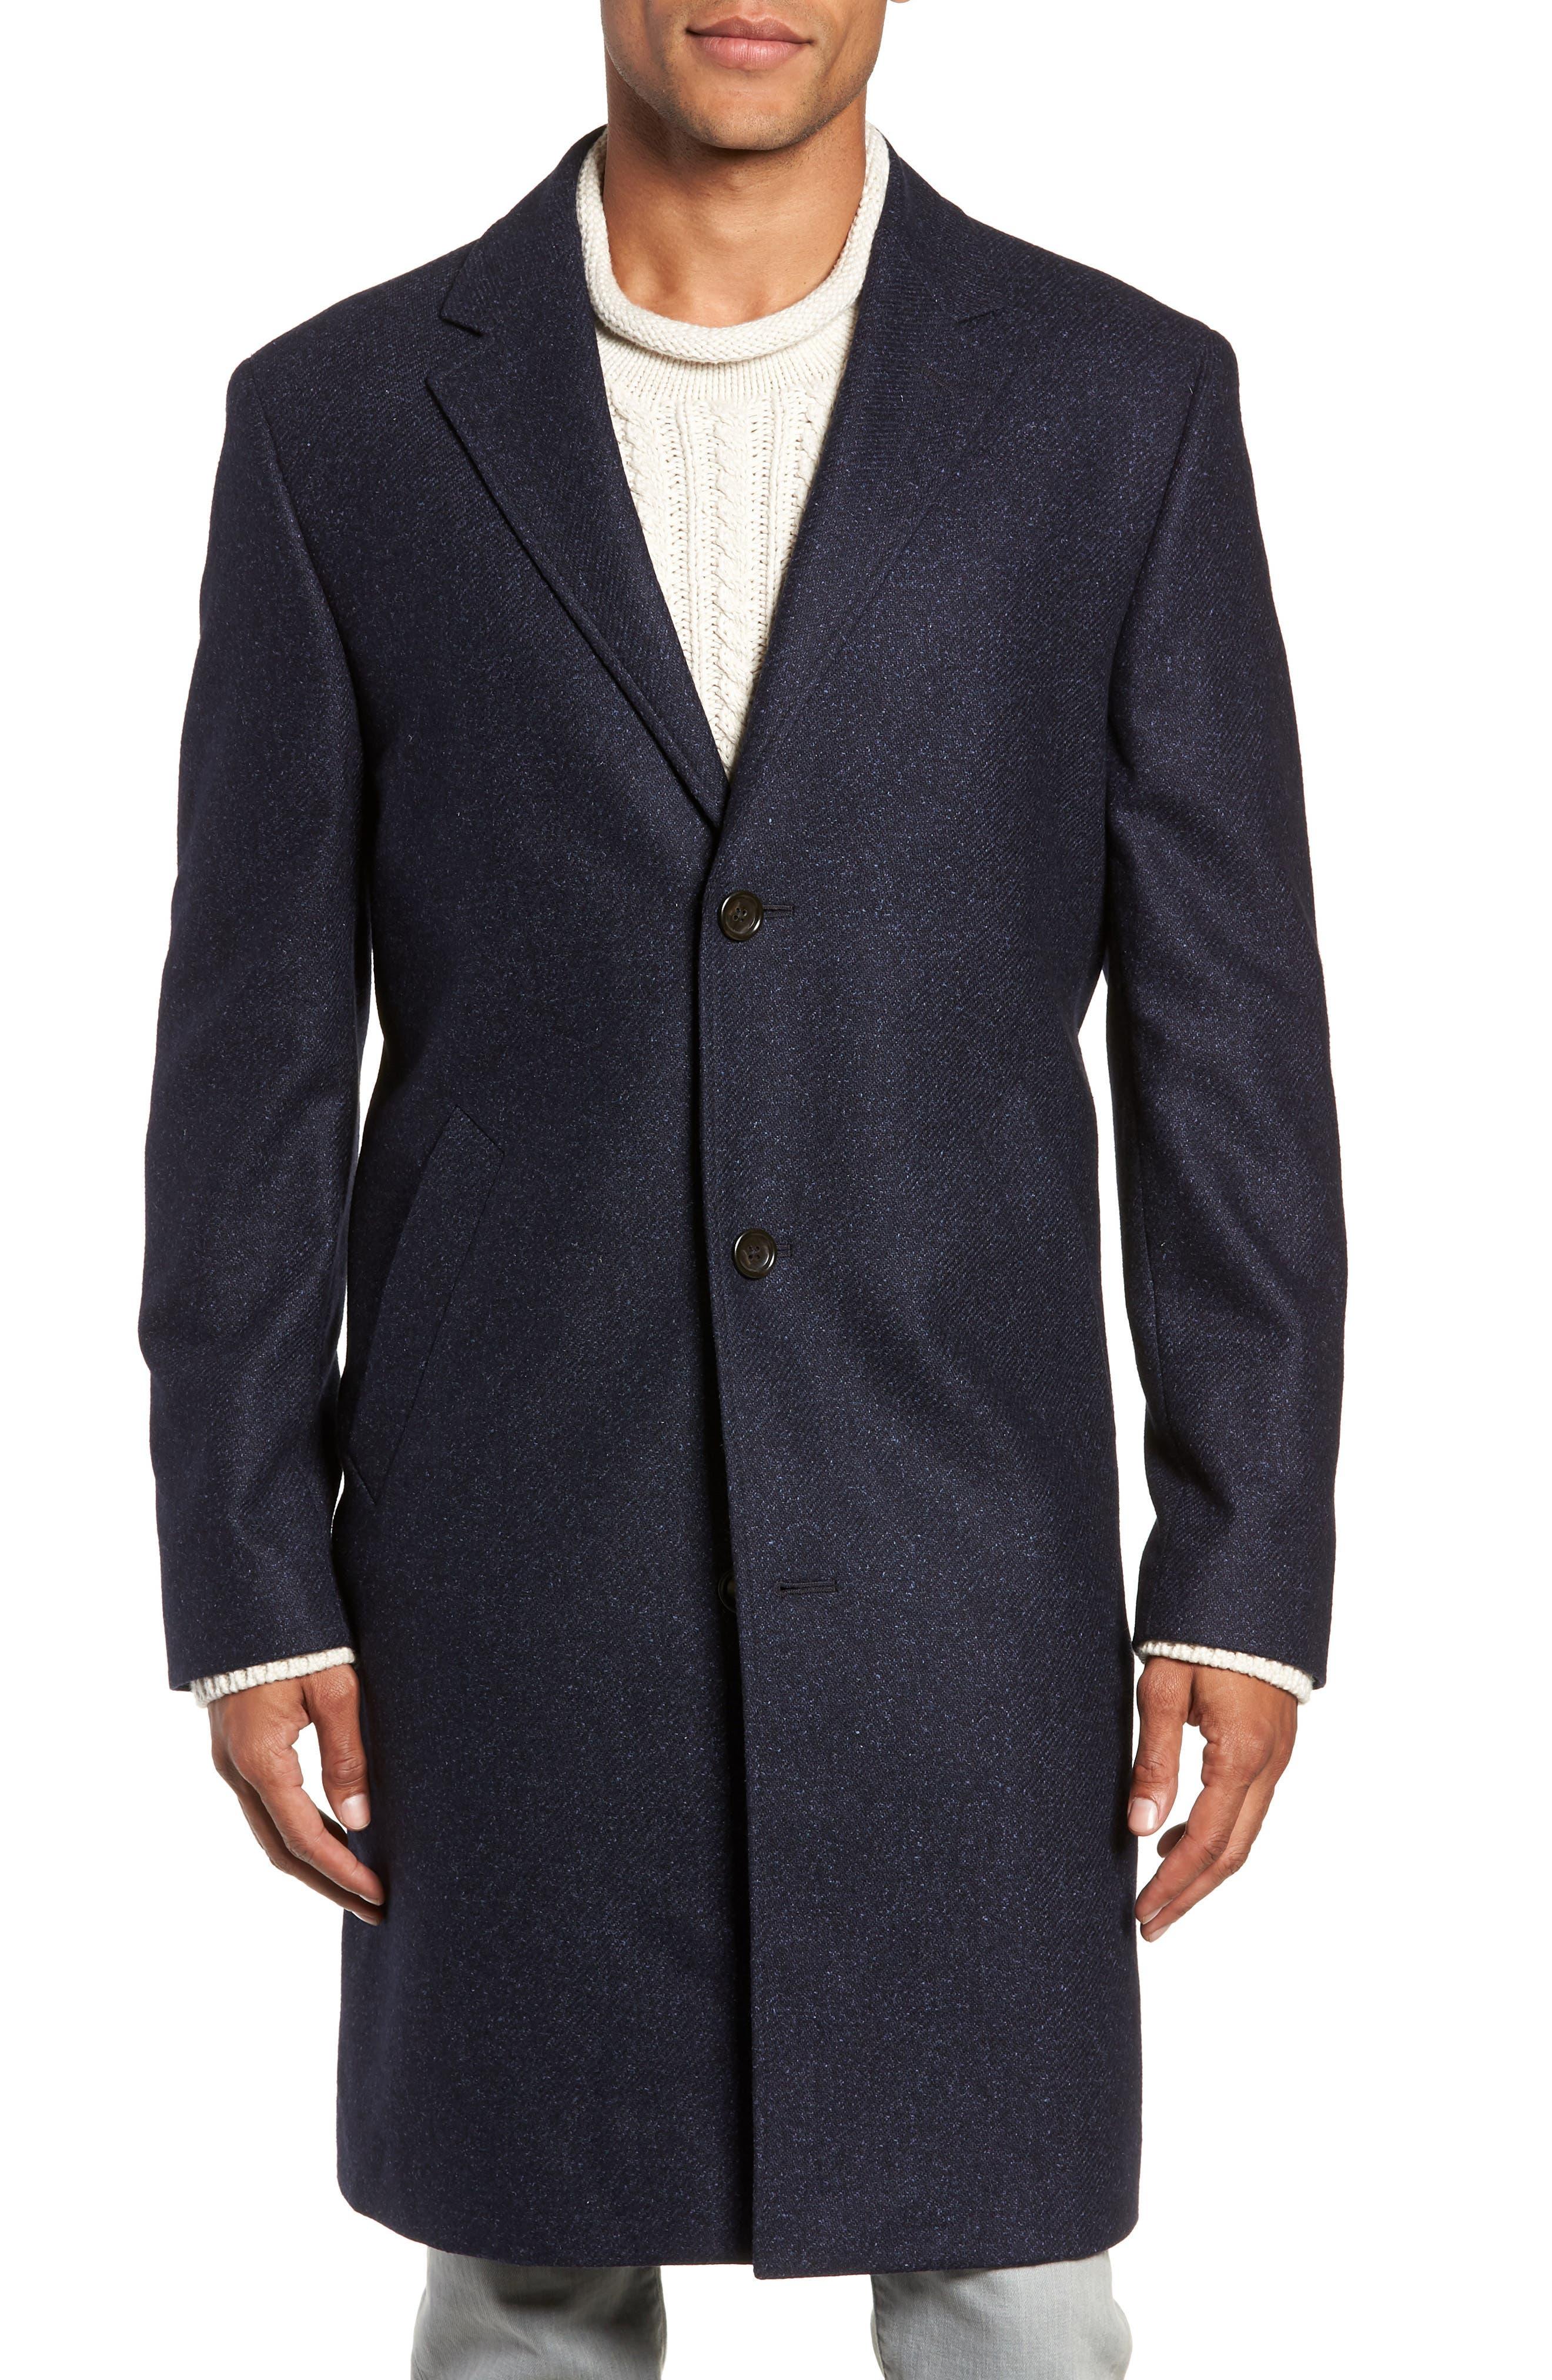 Destination Water Resistant Tweed Topcoat,                             Alternate thumbnail 4, color,                             400